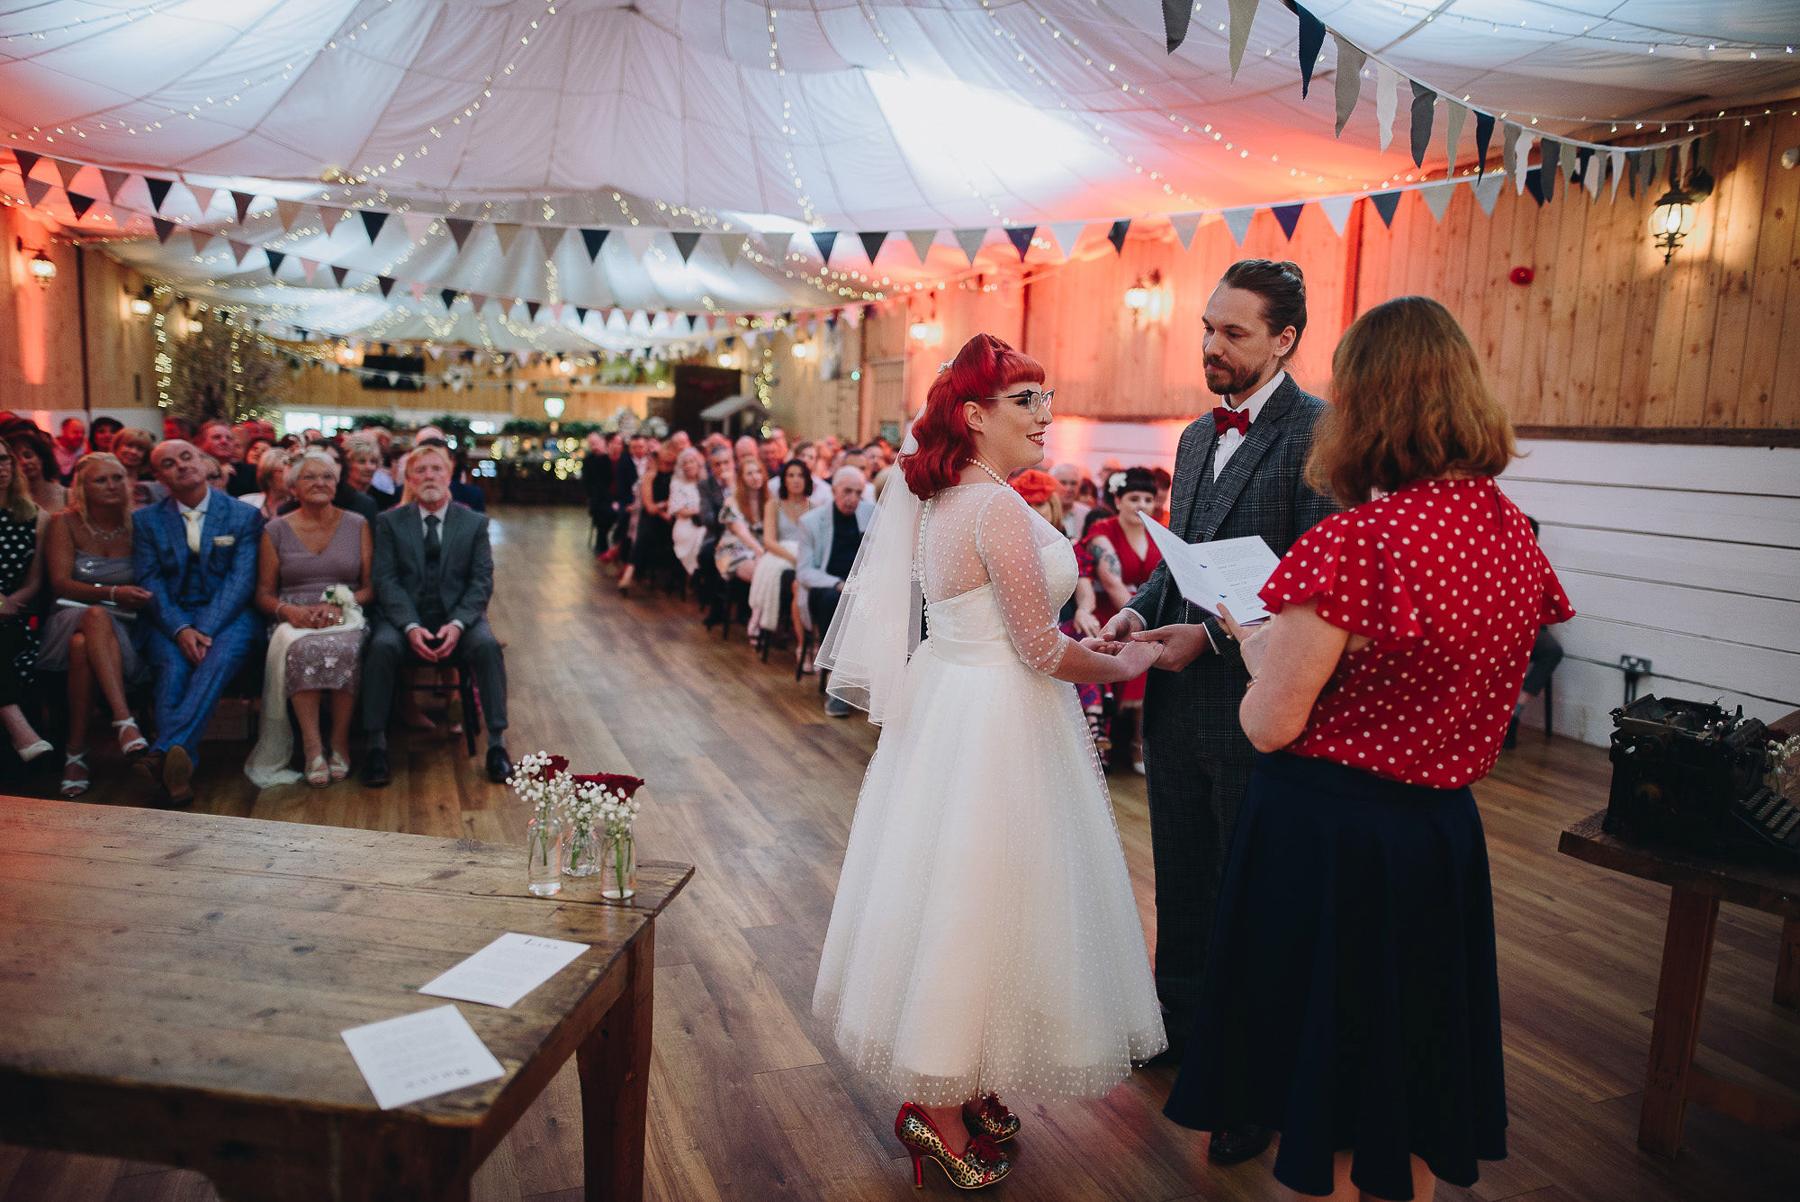 Wellbeing_Farm_Wedding_Photography_The_Pin-Up_Bride_Lara_Shaun-66.jpg